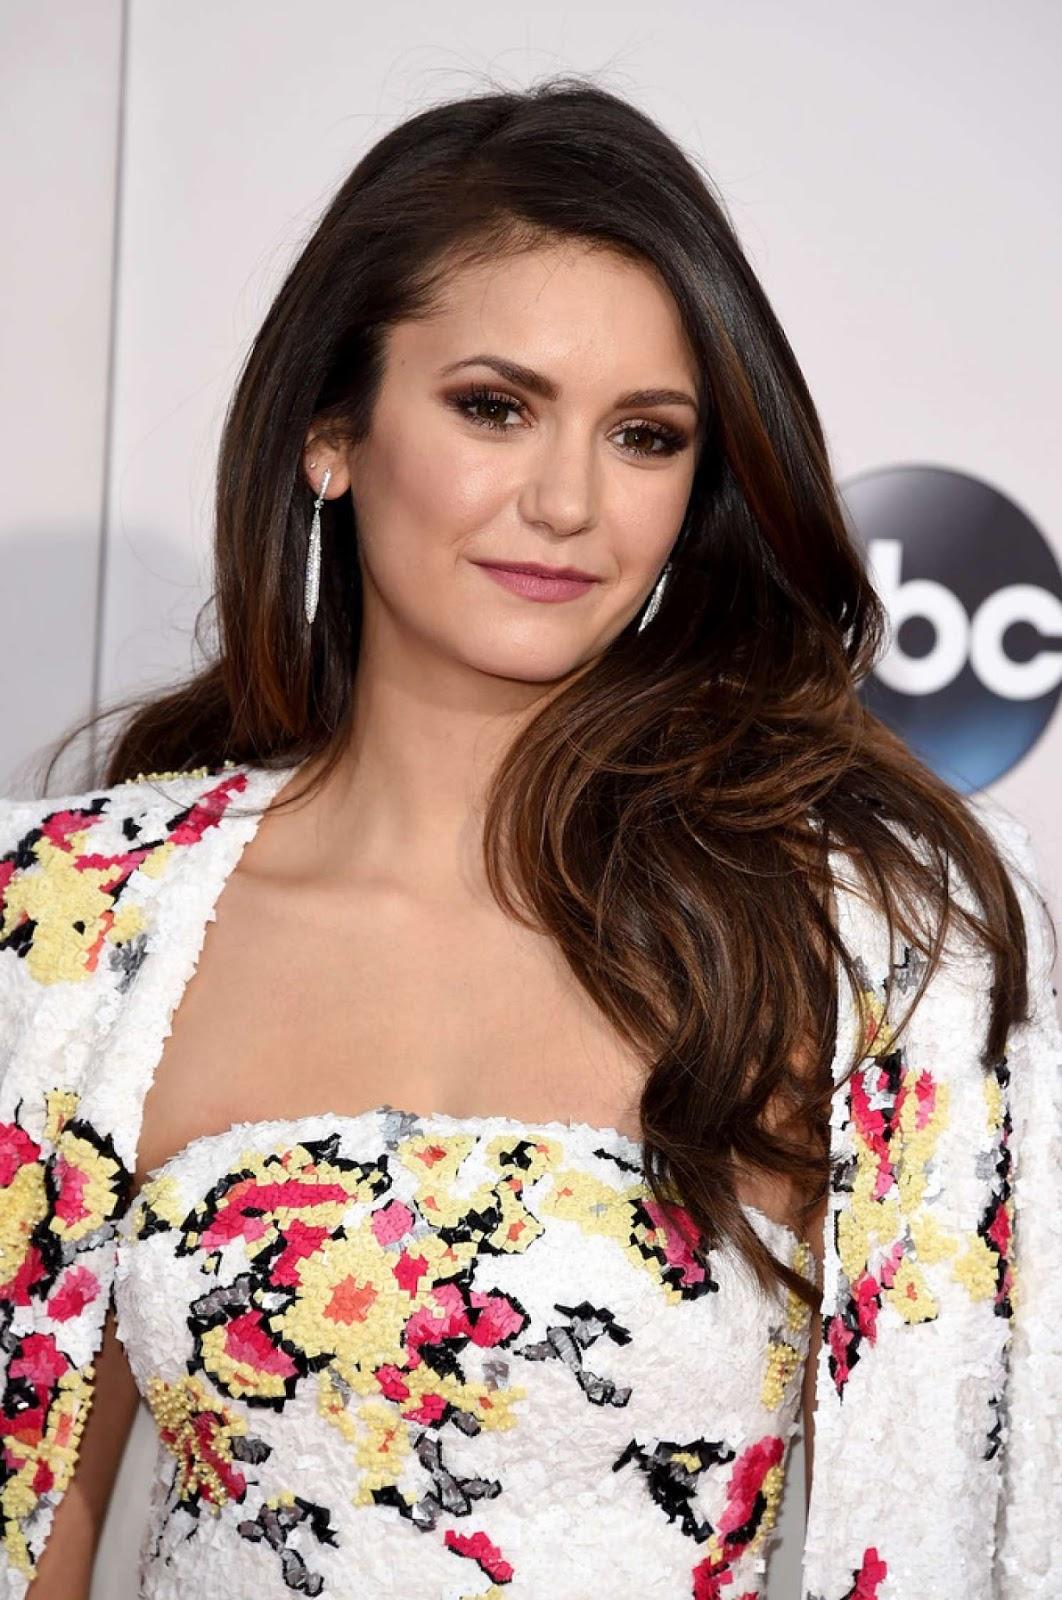 Actress of 'The Vampire Diaries' Nina Dobrev HD Images, Photos & Wallpapers